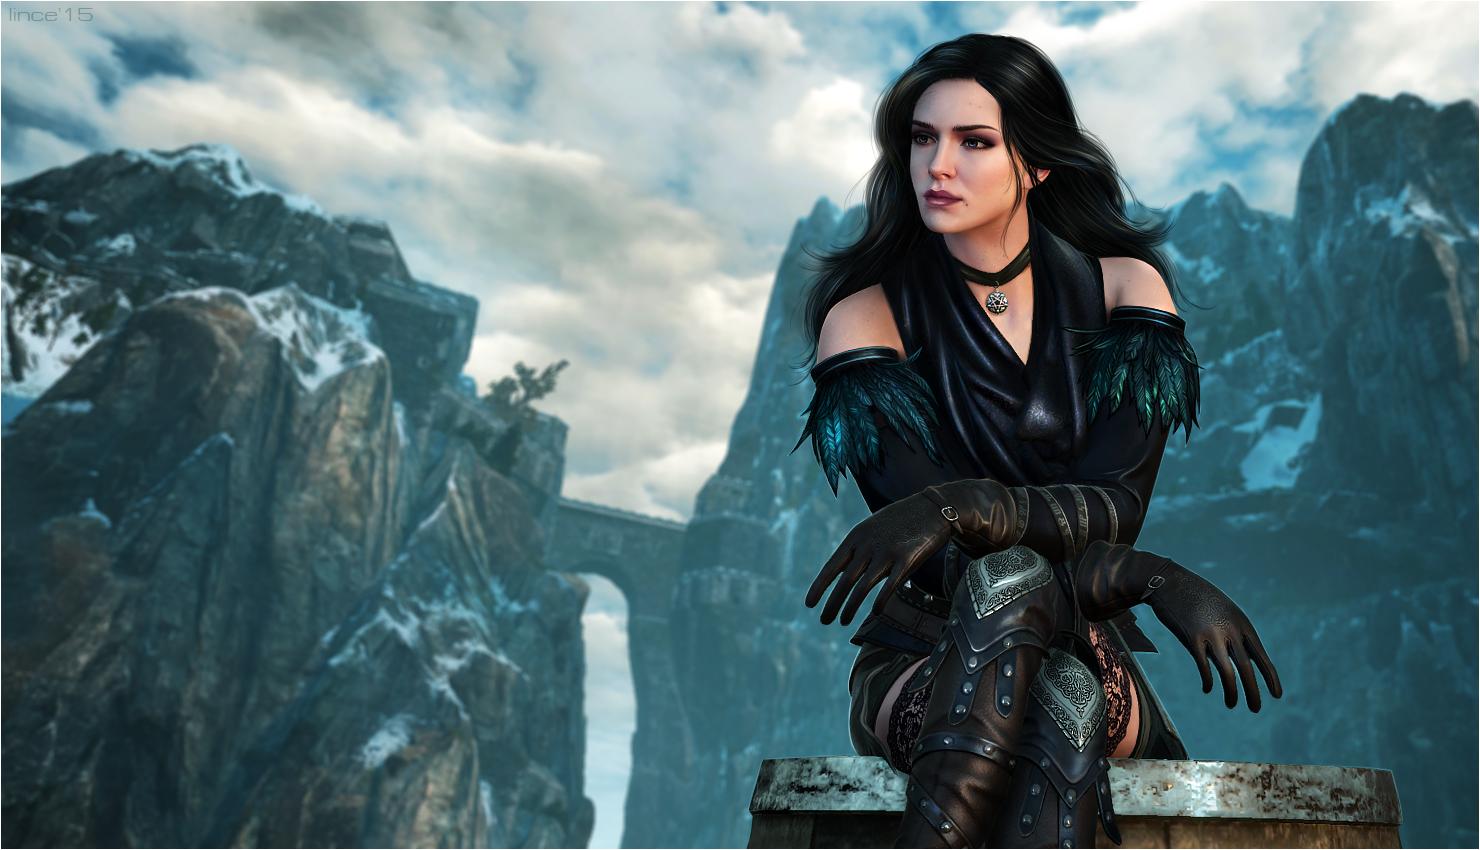 The Witcher 3 Yennefer By Linceeslanieva On Deviantart